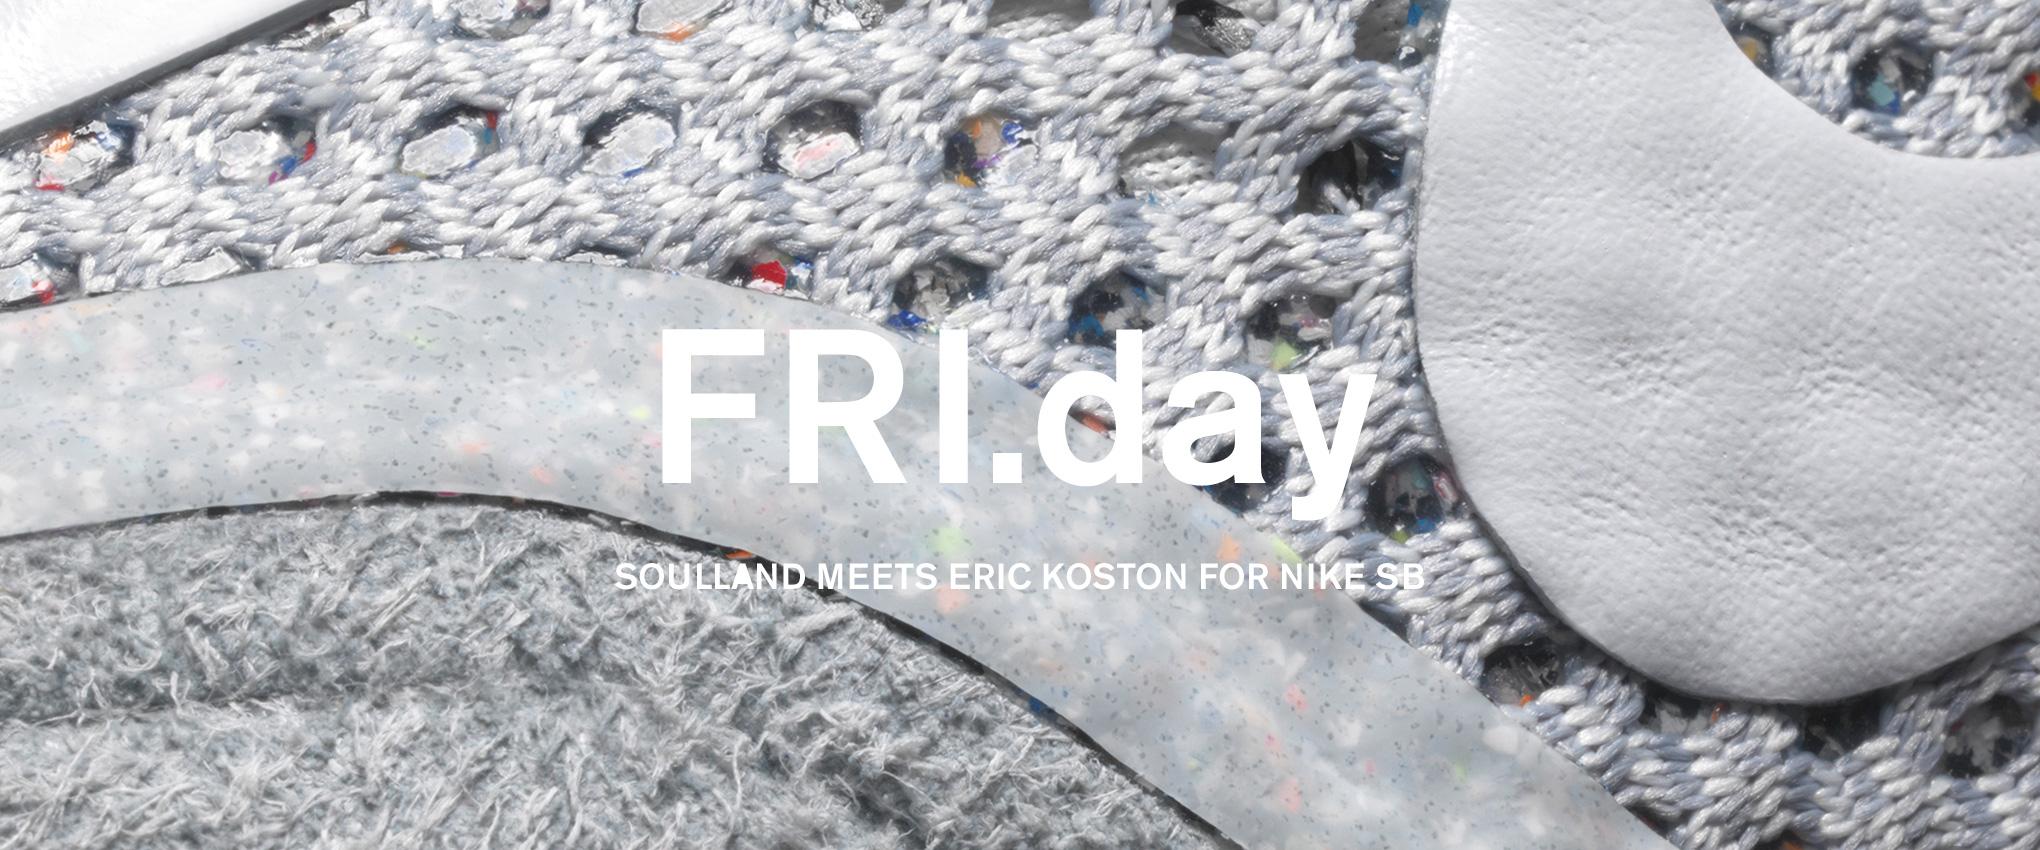 Streetmachine   Street Machine Copenhagen - Shop the Soulland meets Eric Koston for Nike SB capsule collection